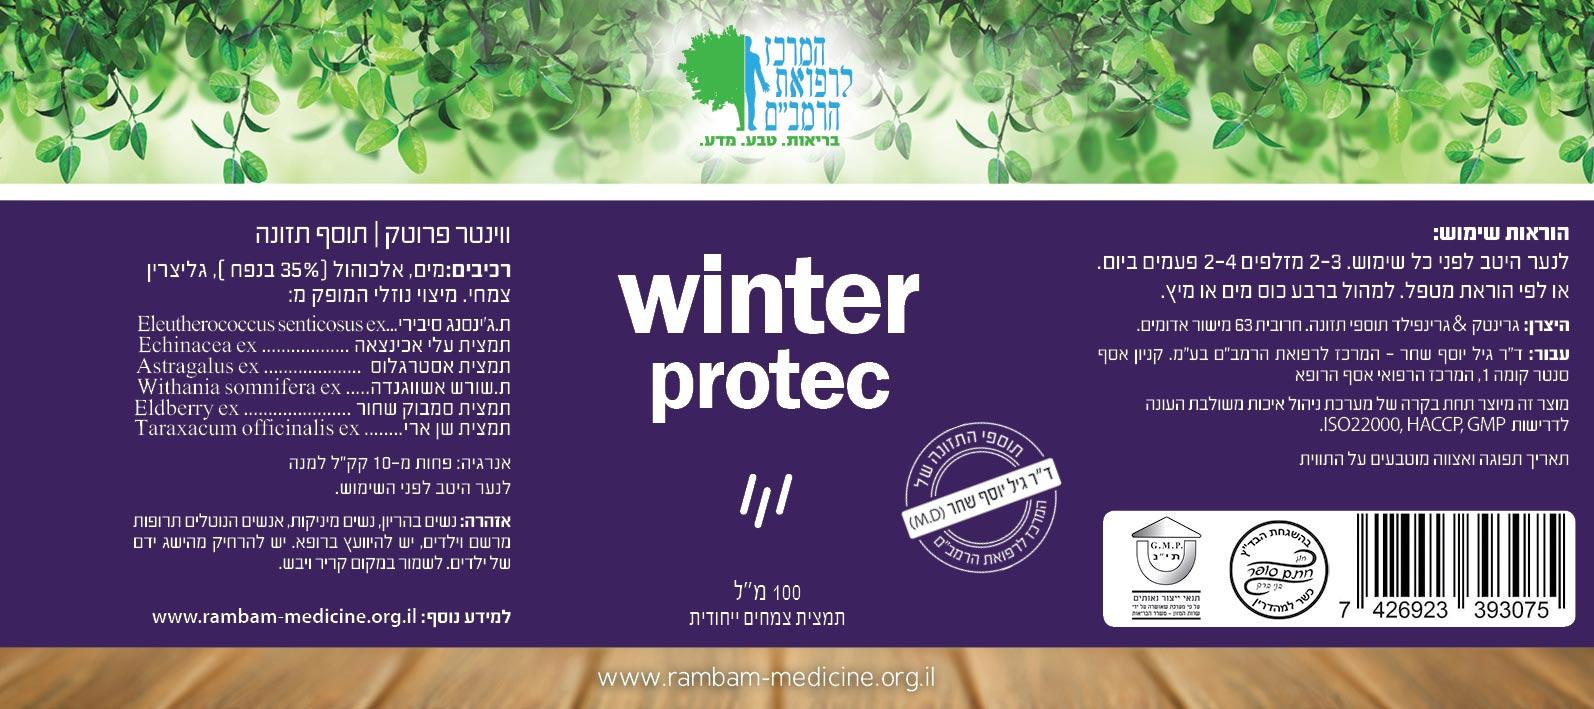 winter protec - חורף קל ובריא